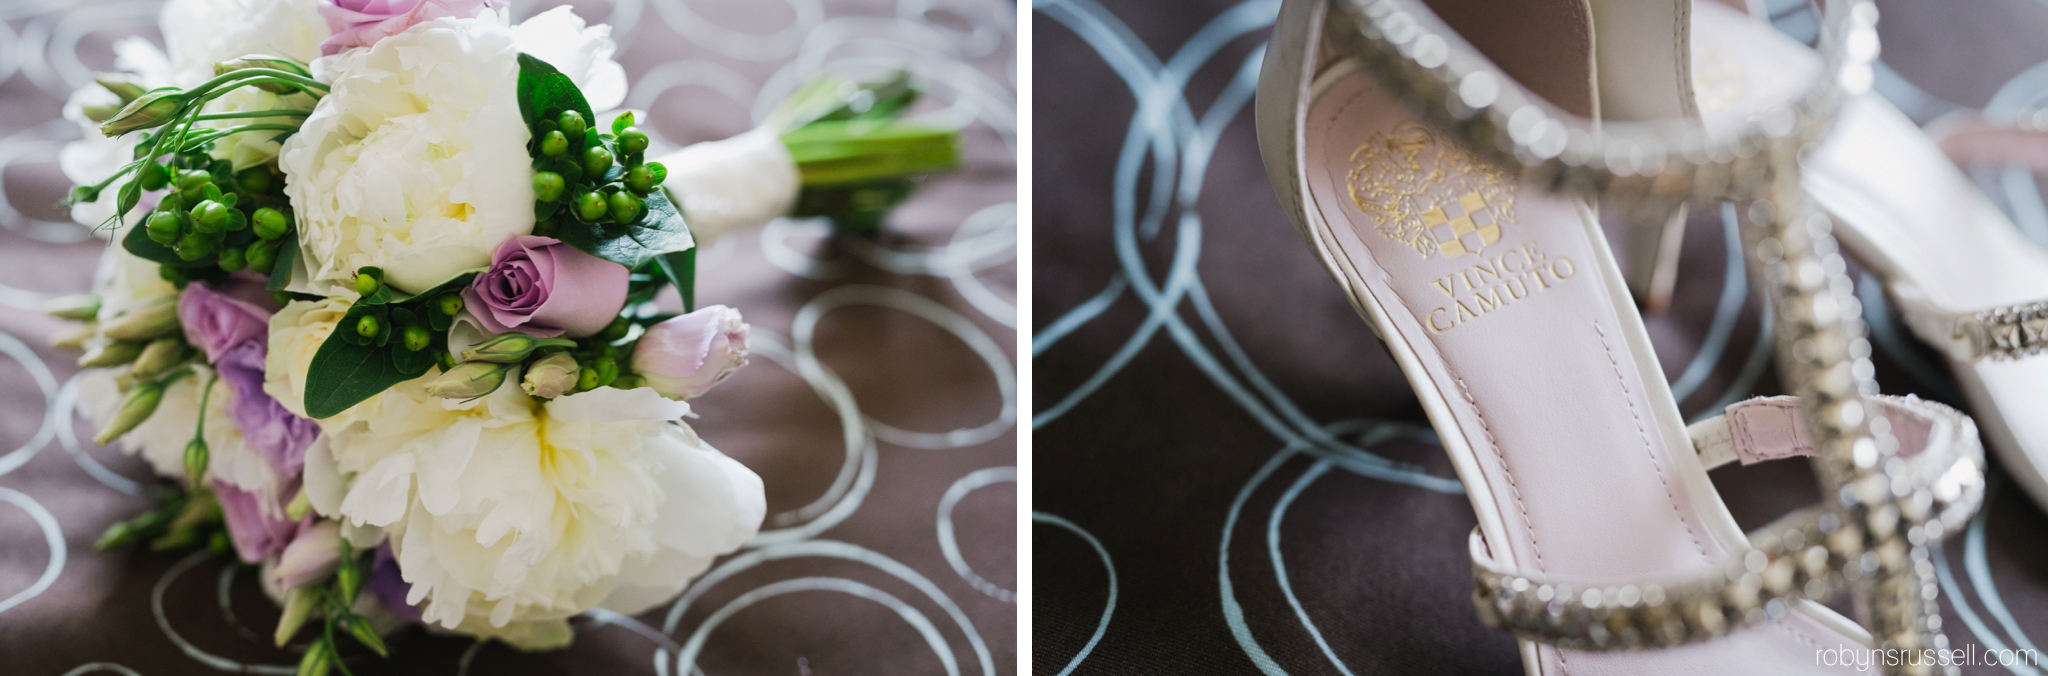 7-wedding-details-flowers-shoes-bride-gets-married.jpg